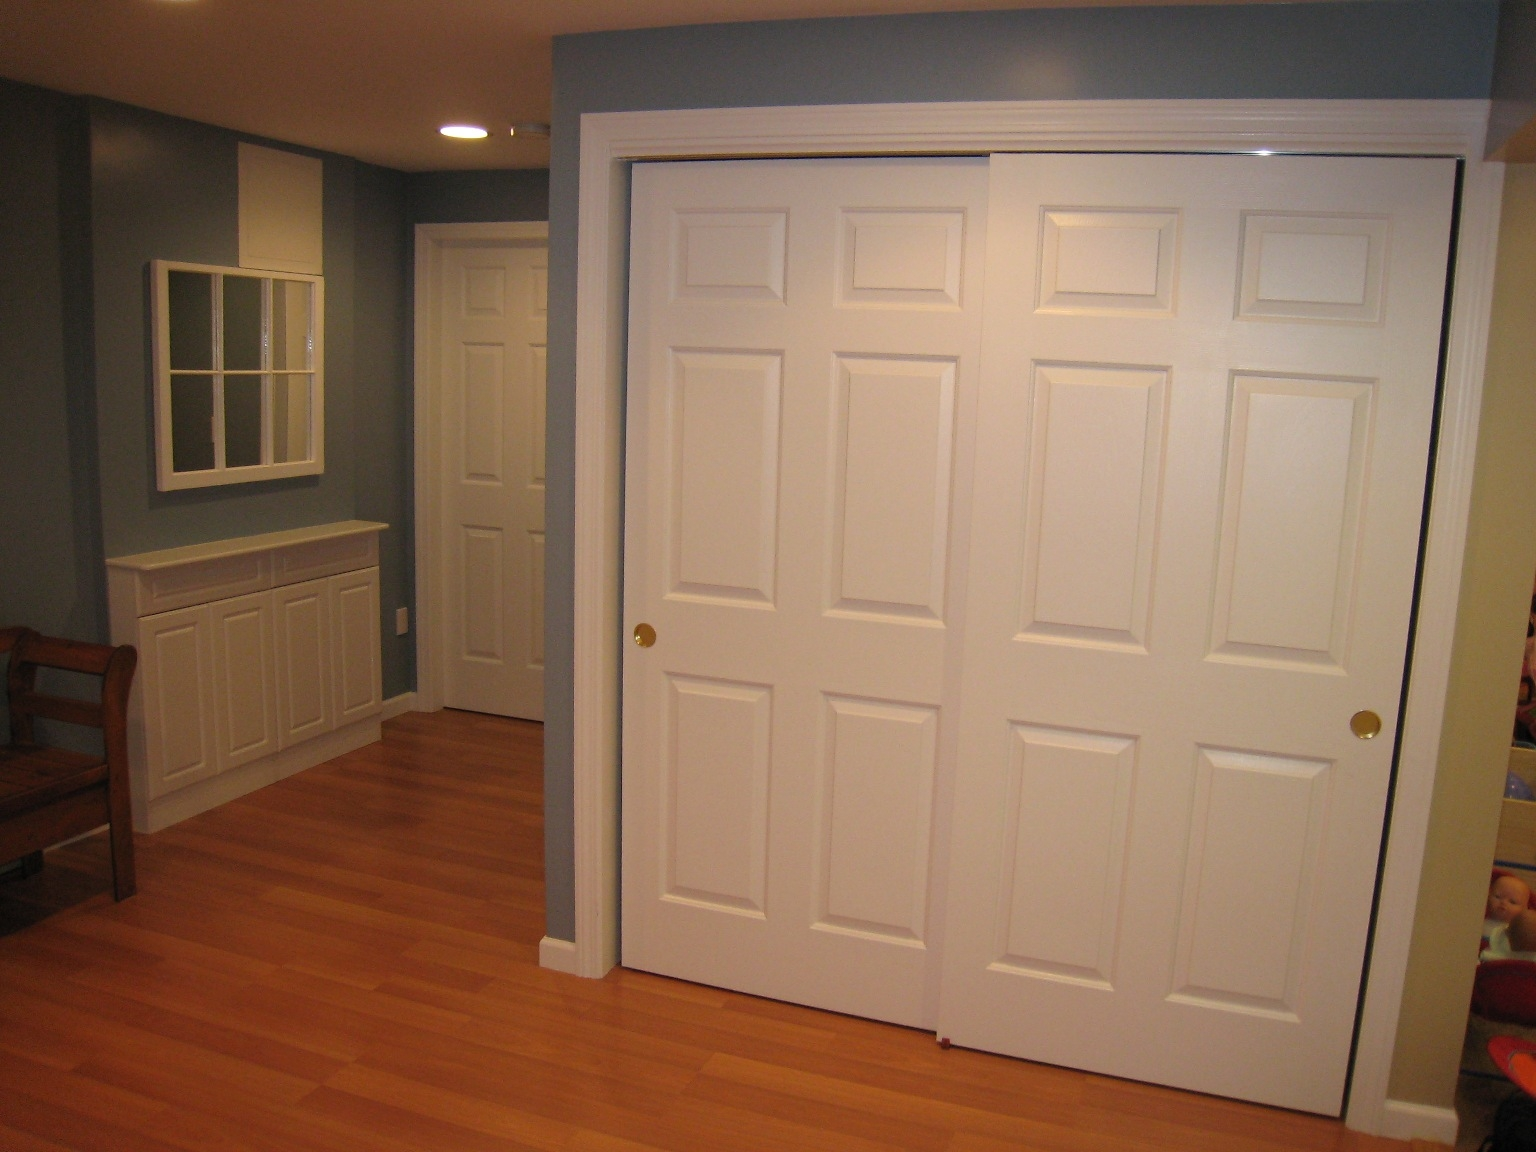 Pictures Of Sliding Closet Doors